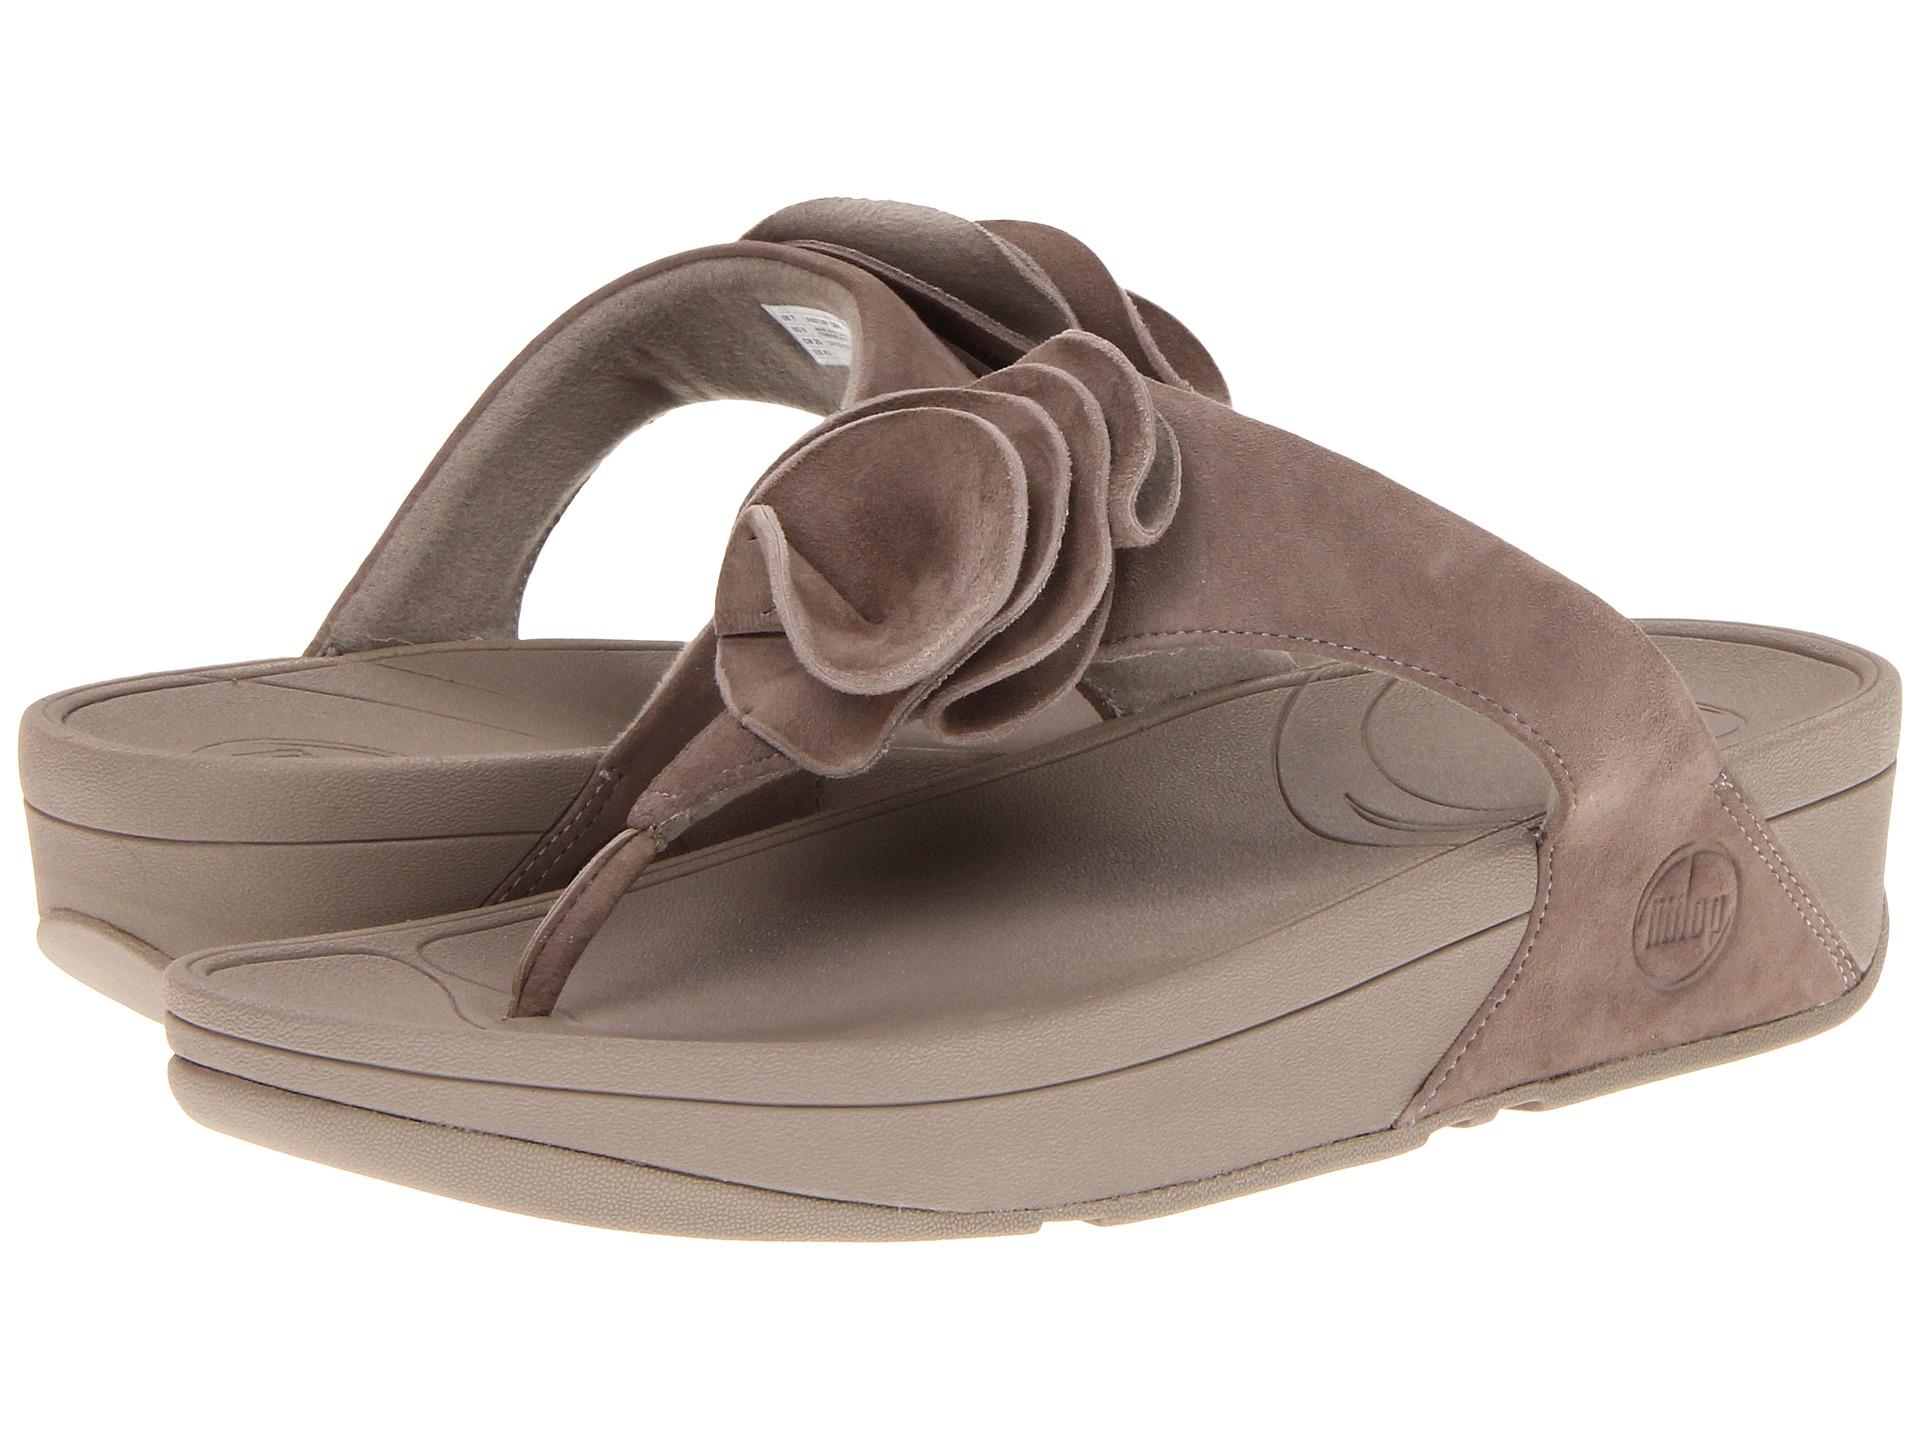 zappos fitflop sale italian sandals. Black Bedroom Furniture Sets. Home Design Ideas